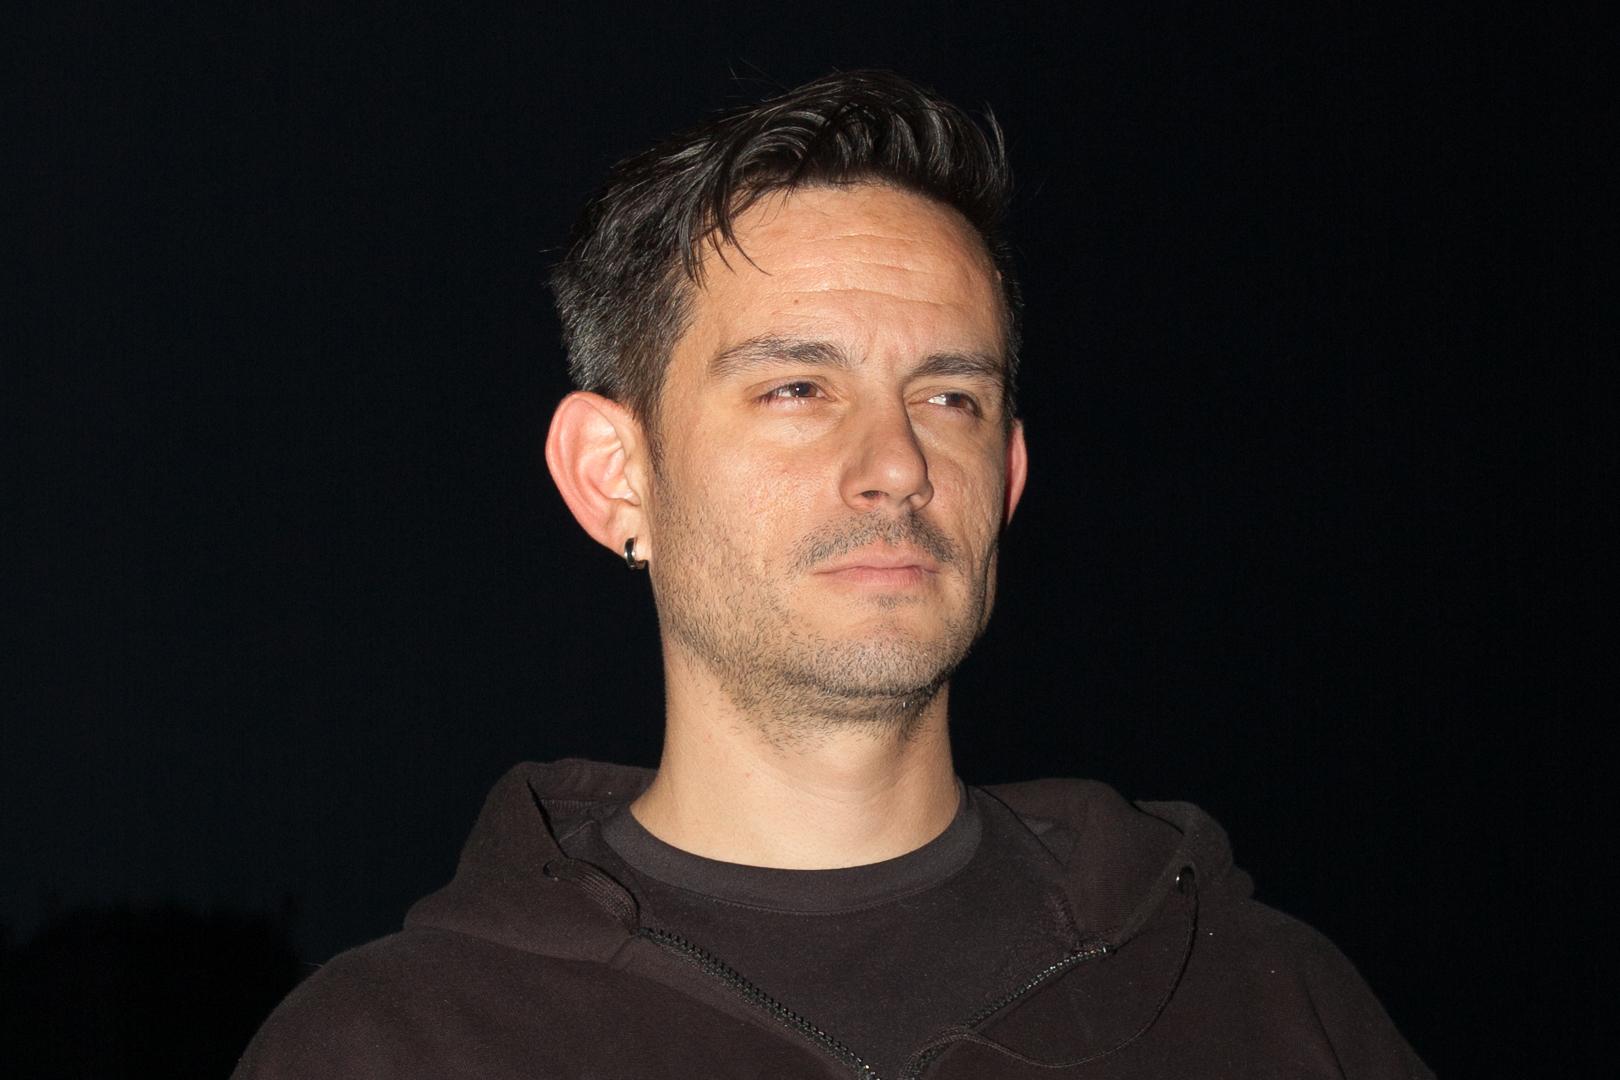 Bartists' Team Member Danny